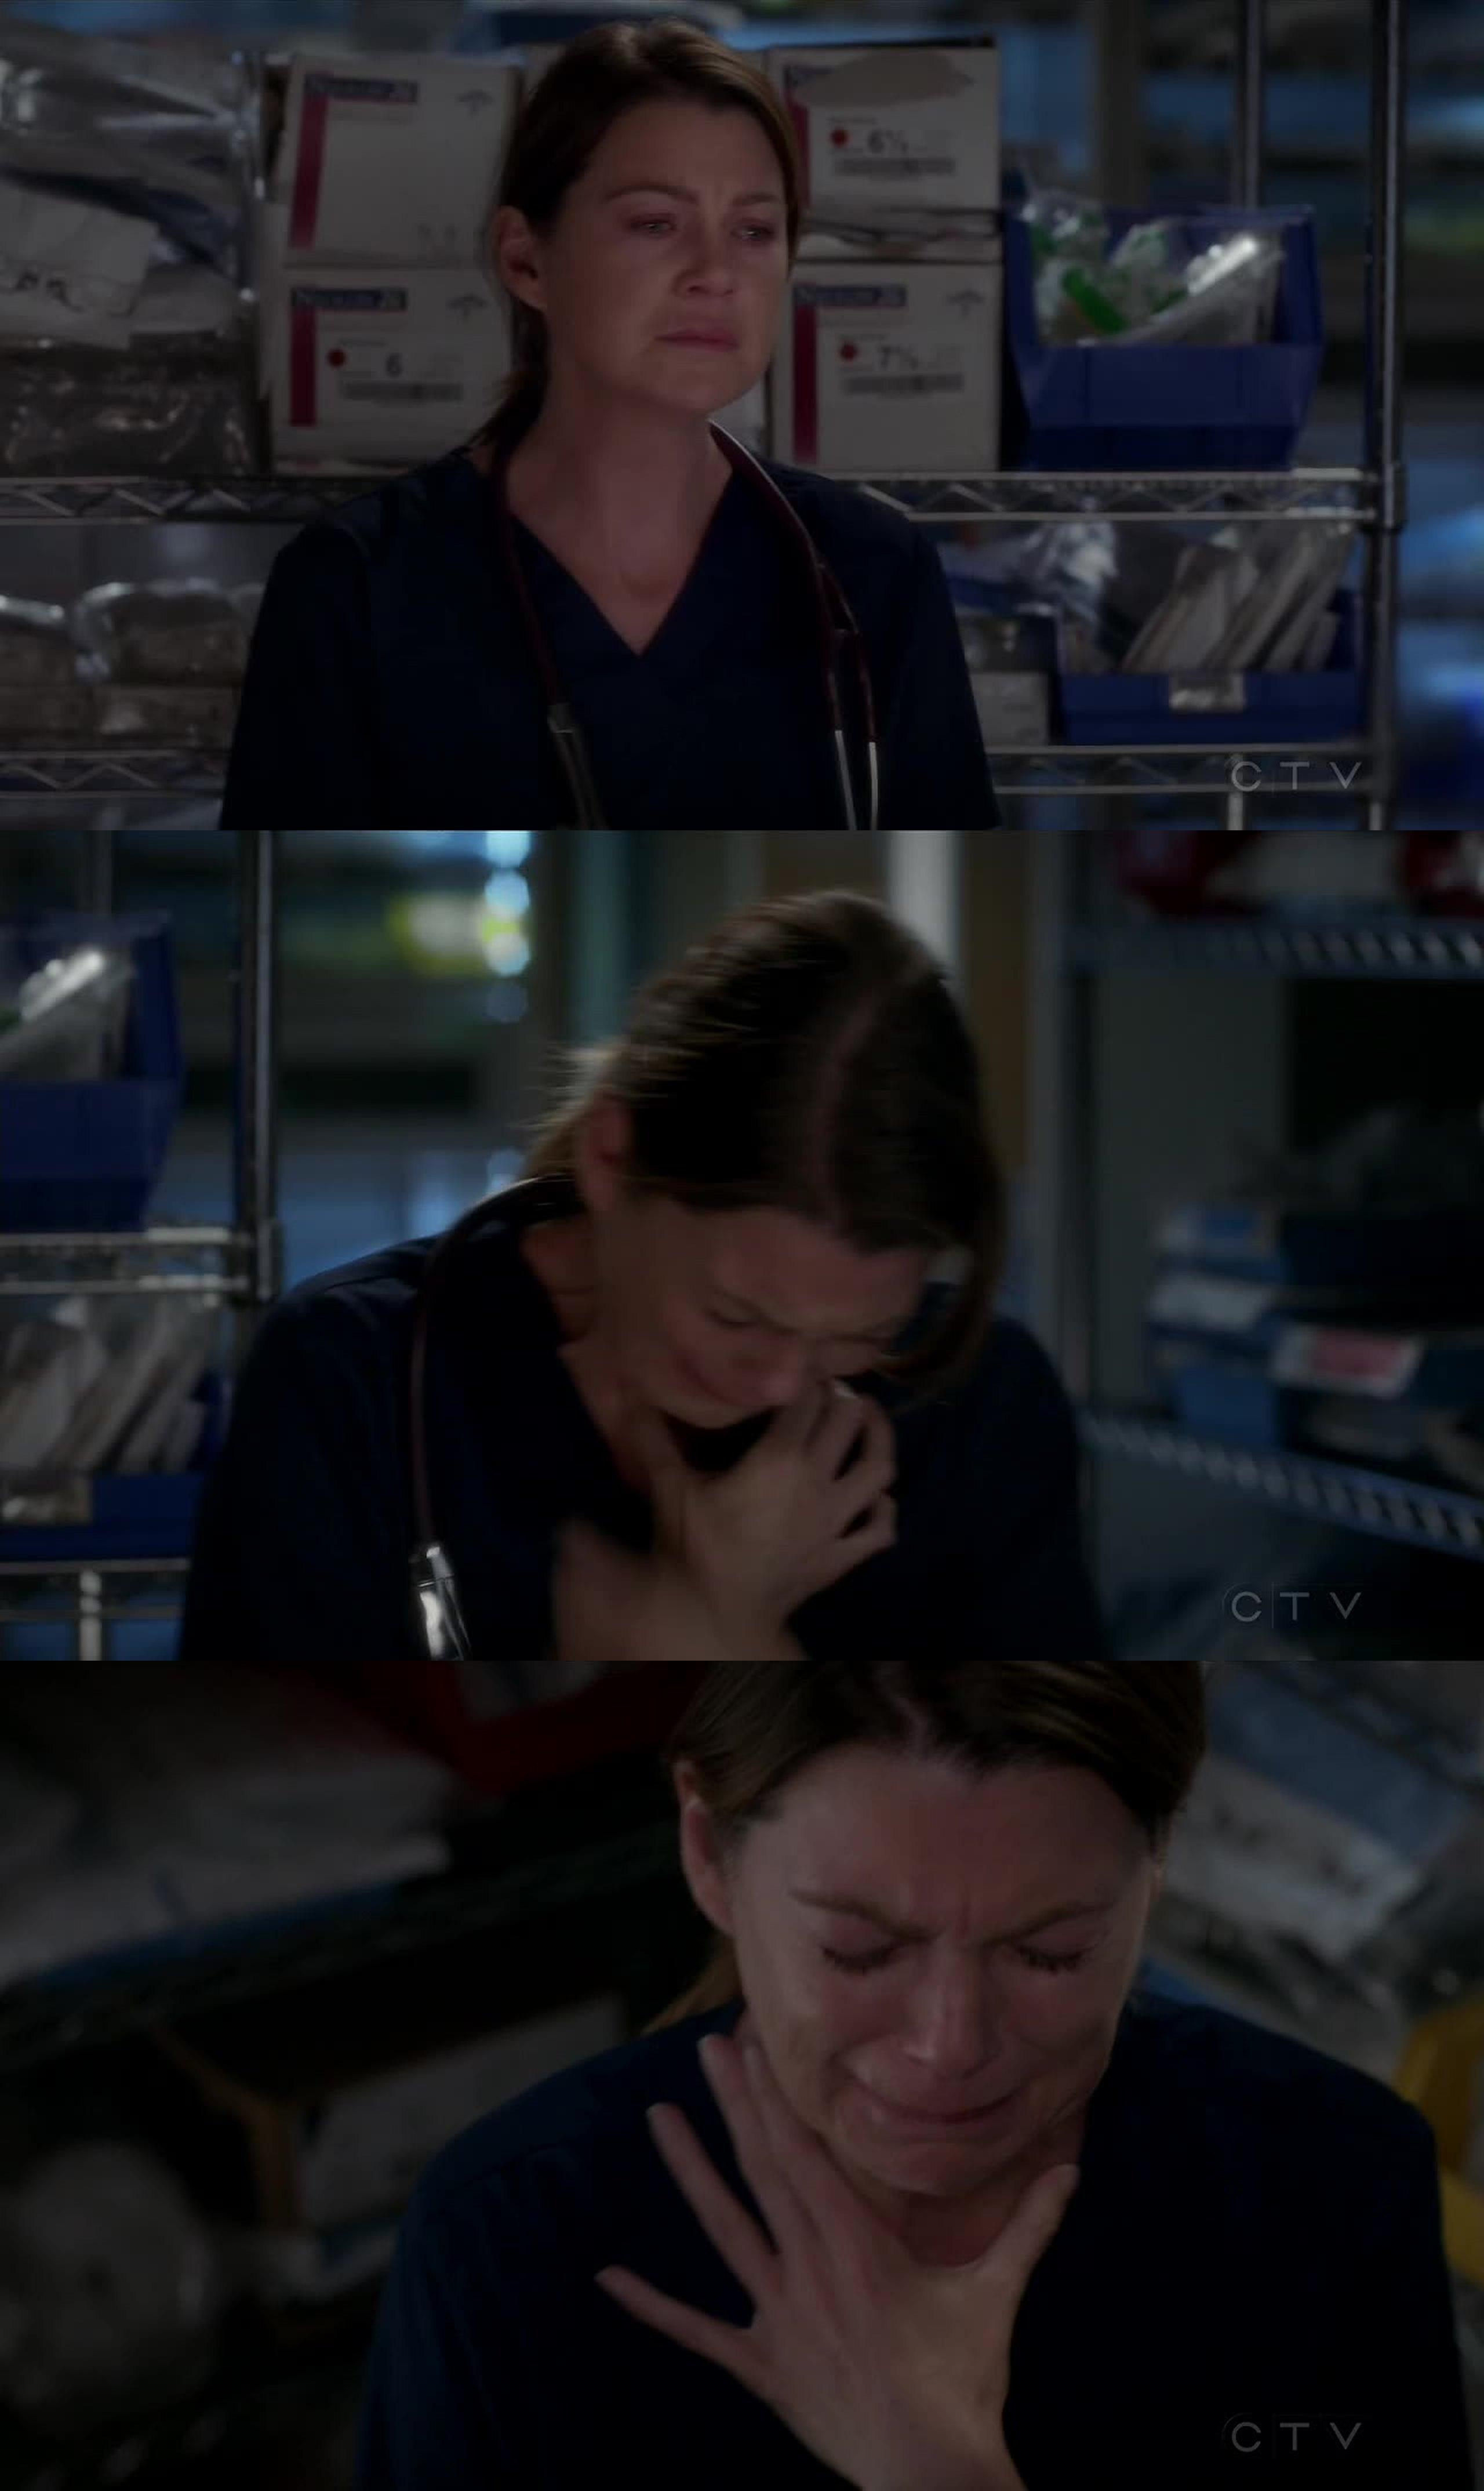 This breaks my heart.